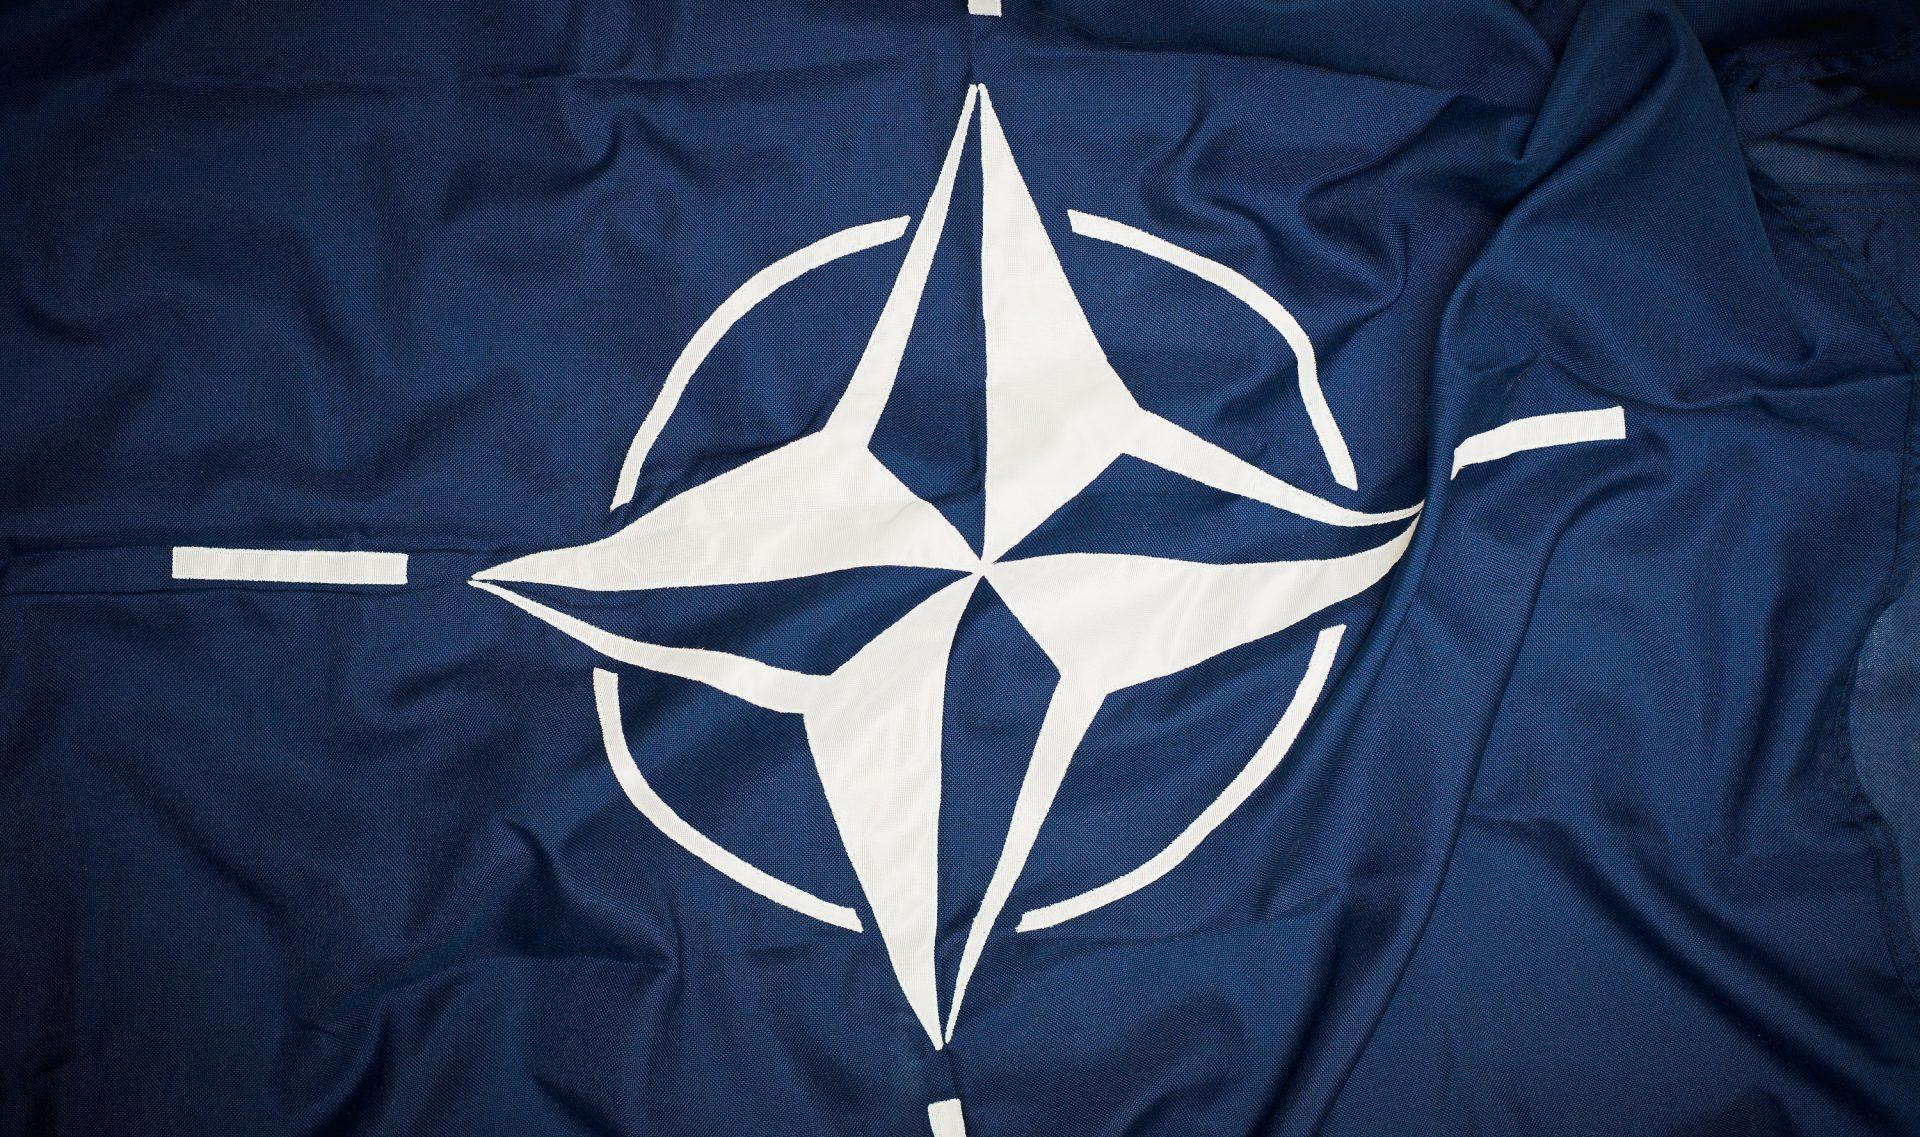 NATO Flag MOD 45157525 e1468343823610